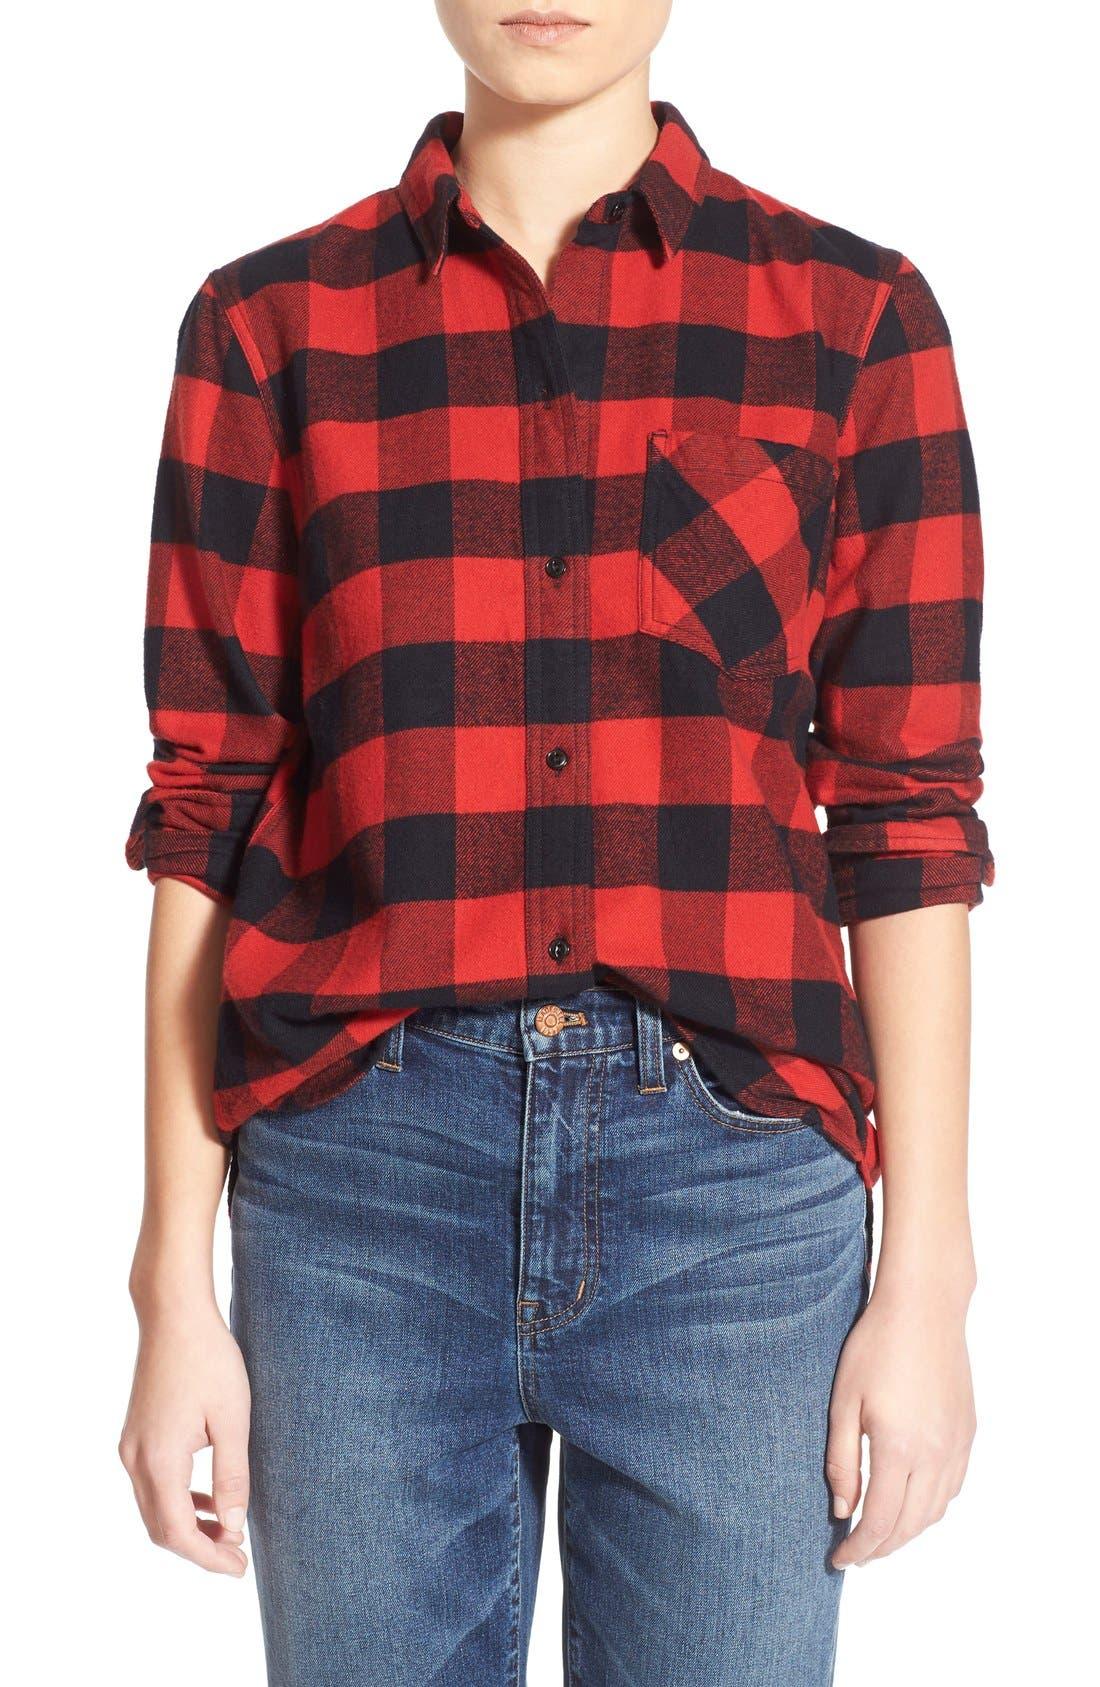 Alternate Image 1 Selected - Madewell 'Ex Boyfriend' Buffalo Check Shirt